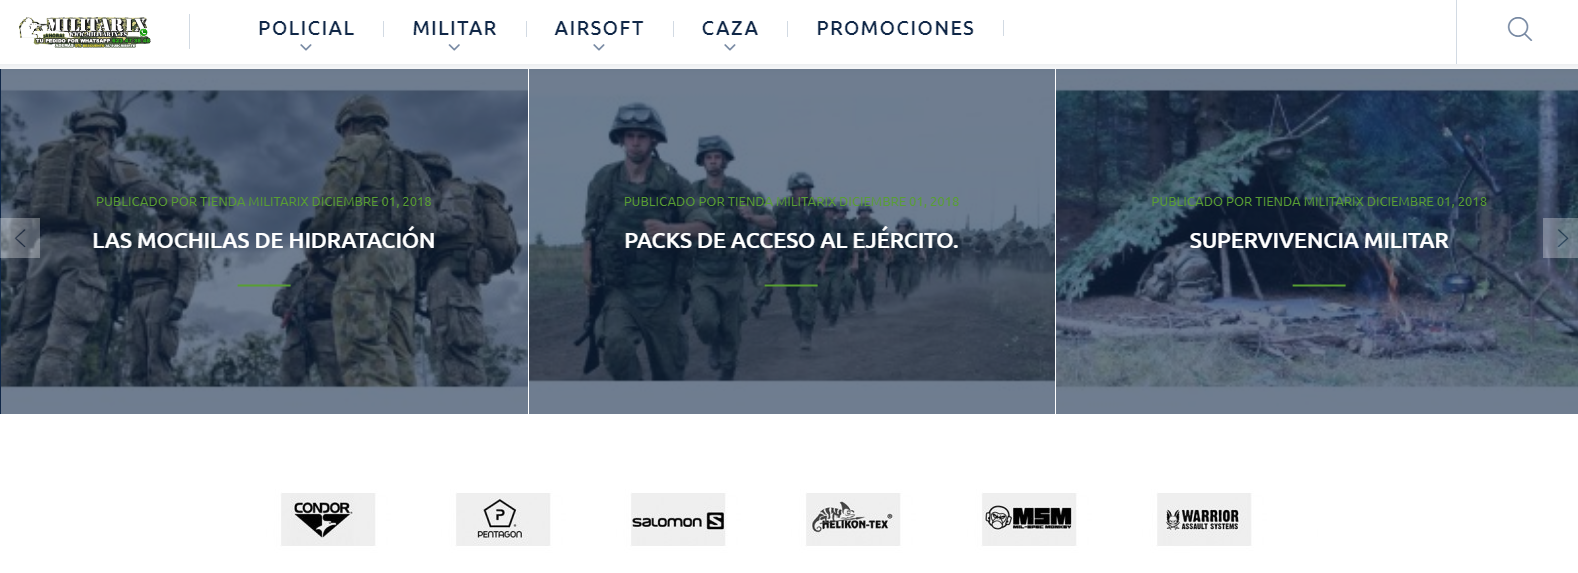 Ropa online militar caza pesca ofertas Militarix